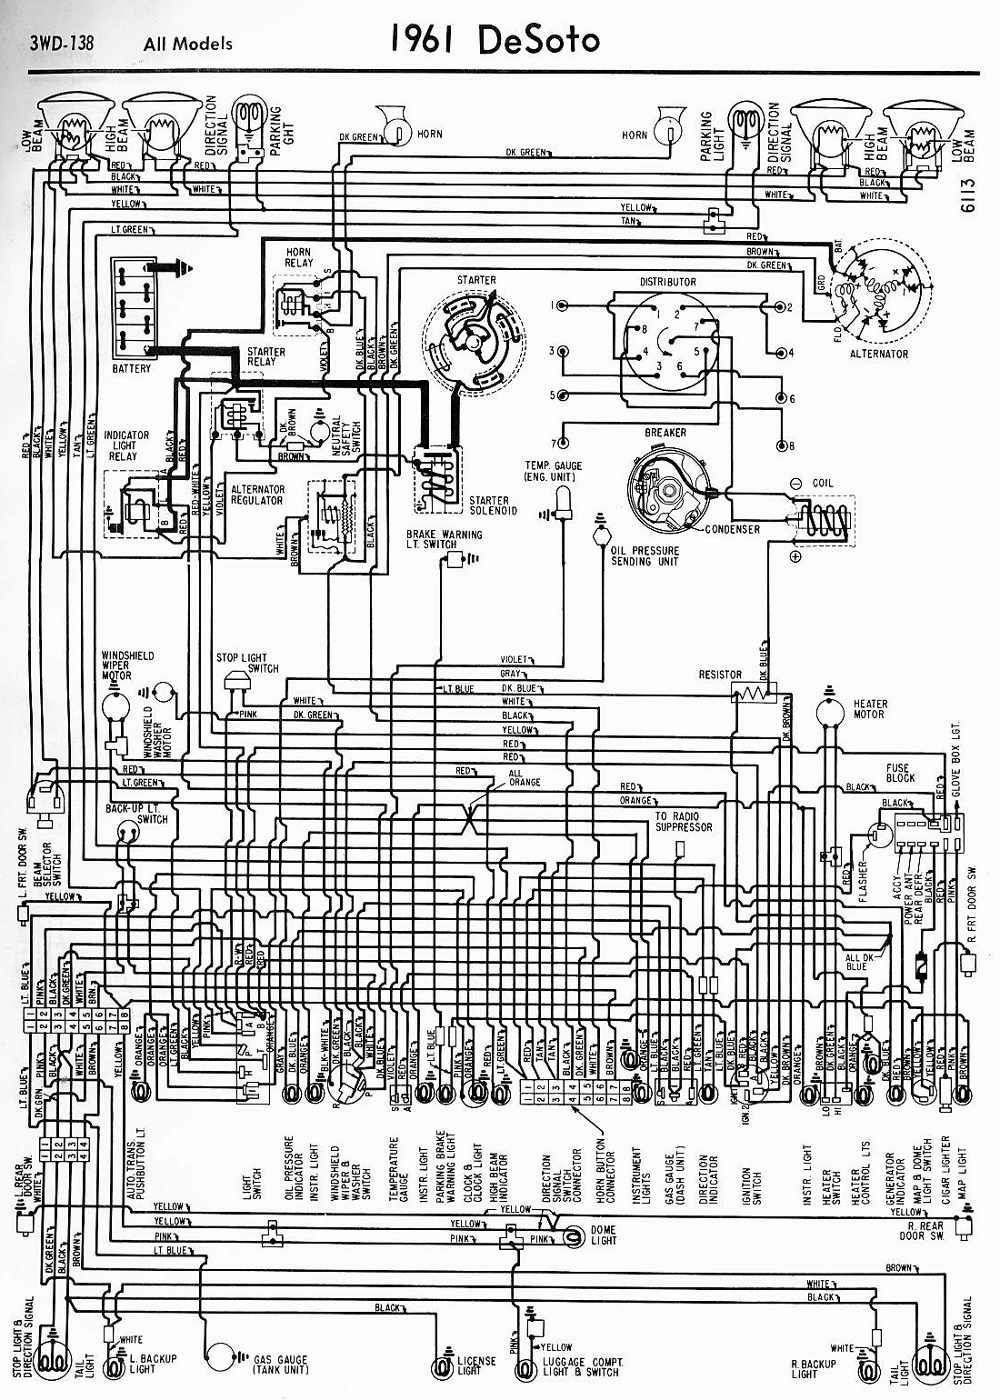 1955 Dodge Wiring Diagram Online Ford Falcon Desoto Simple Schema Pontiac 1951 Free